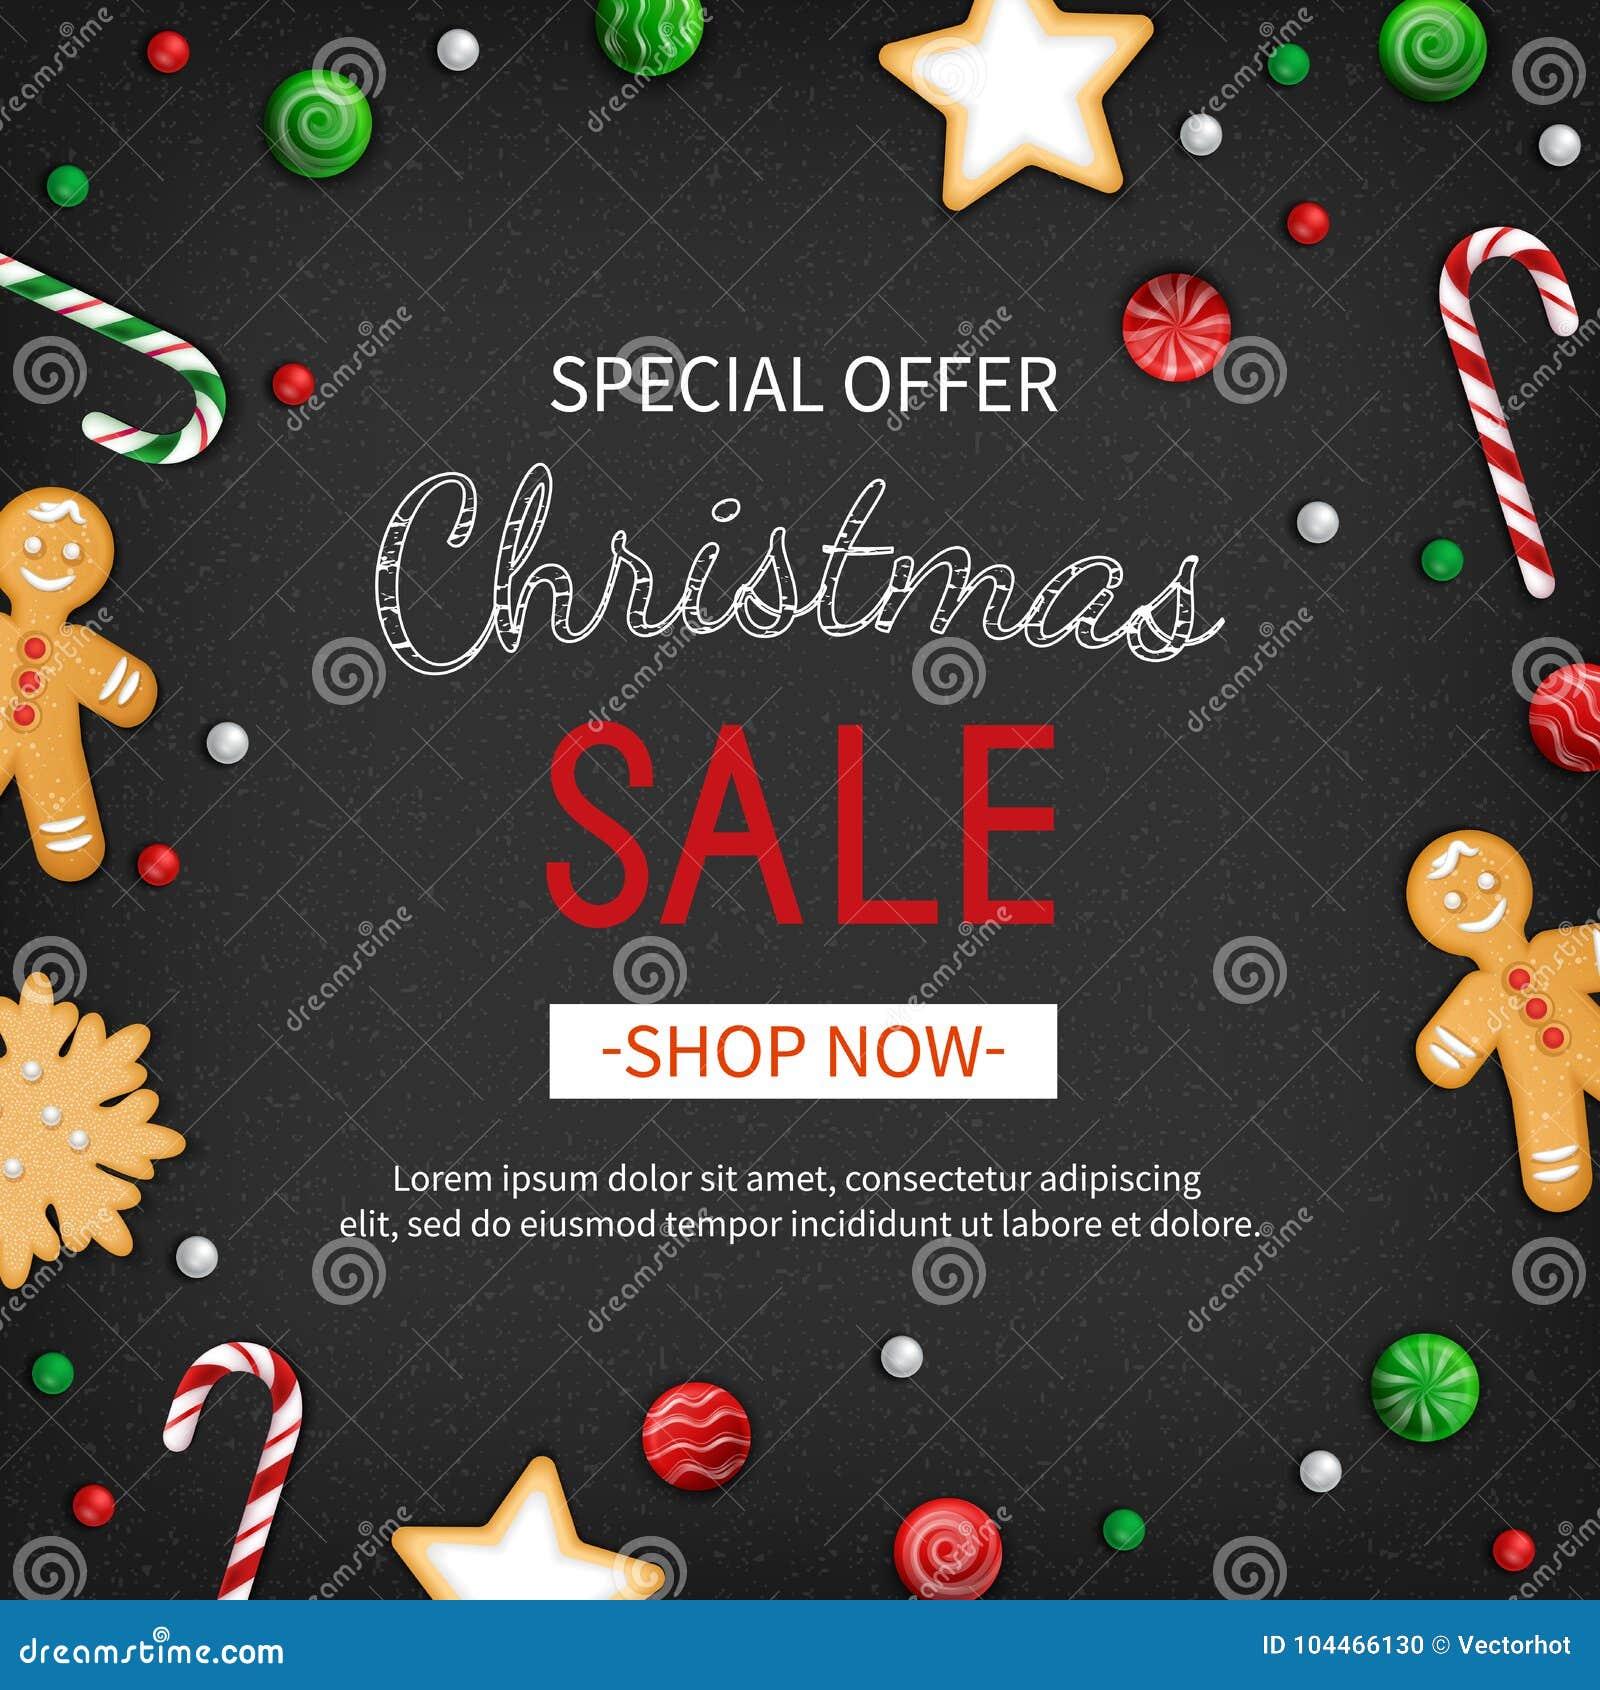 Special Offer Christmas Sale Discount Flyer Big Seasonal Sale Web